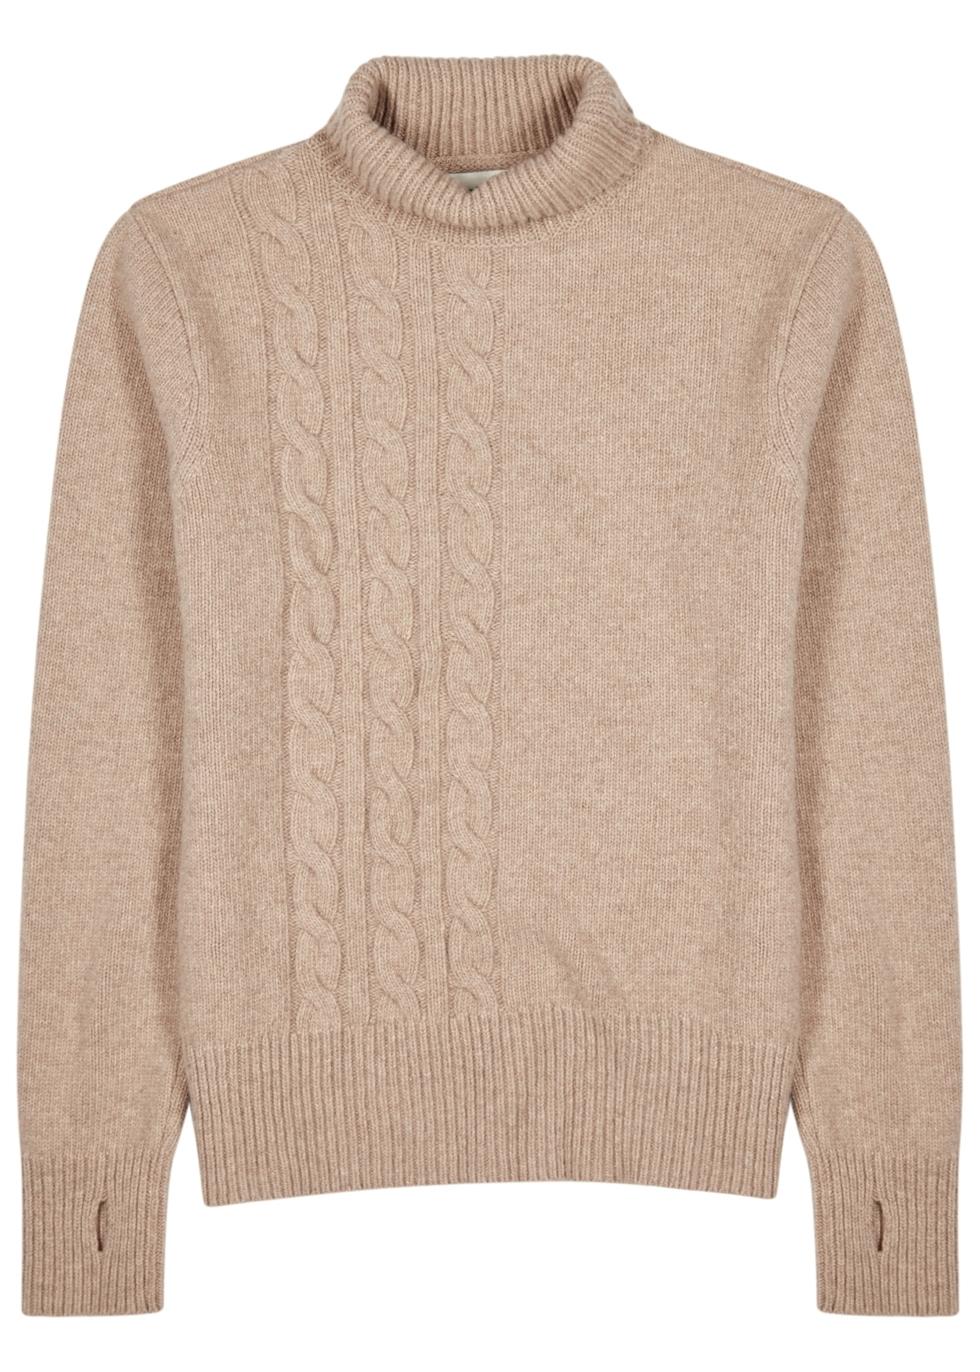 cf22936095 Men s Designer Knitwear and Jumpers - Harvey Nichols